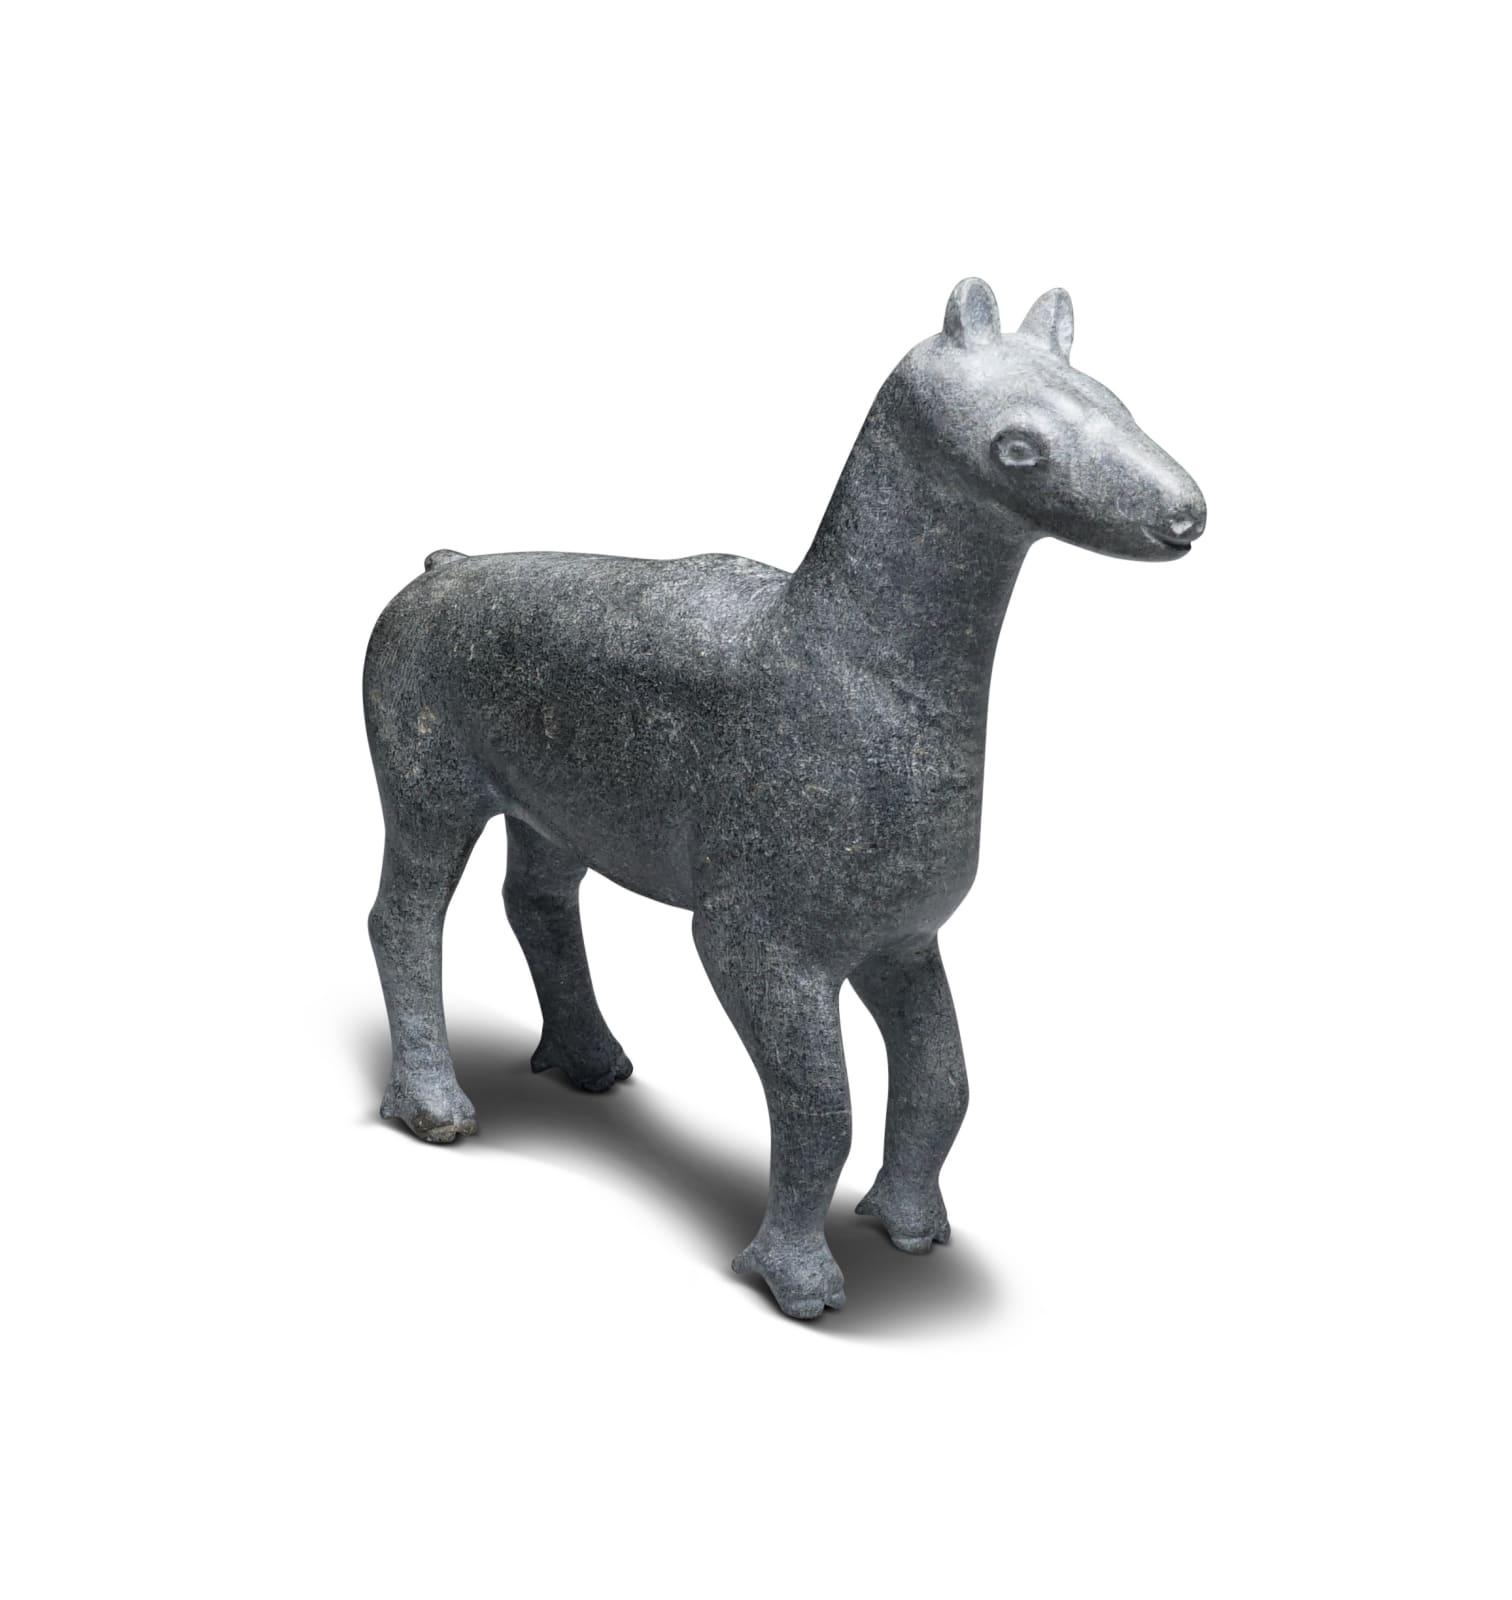 Probably: SAMMY NASSAK (1905-1988) KANGIRSUK (PAYNE BAY / BELLIN) Caribou Calf stone, 5 1/2 x 6 x 2 in (14 x 15.2 x 5.1 cm) ESTIMATE: $400 — $600 New Price: $350